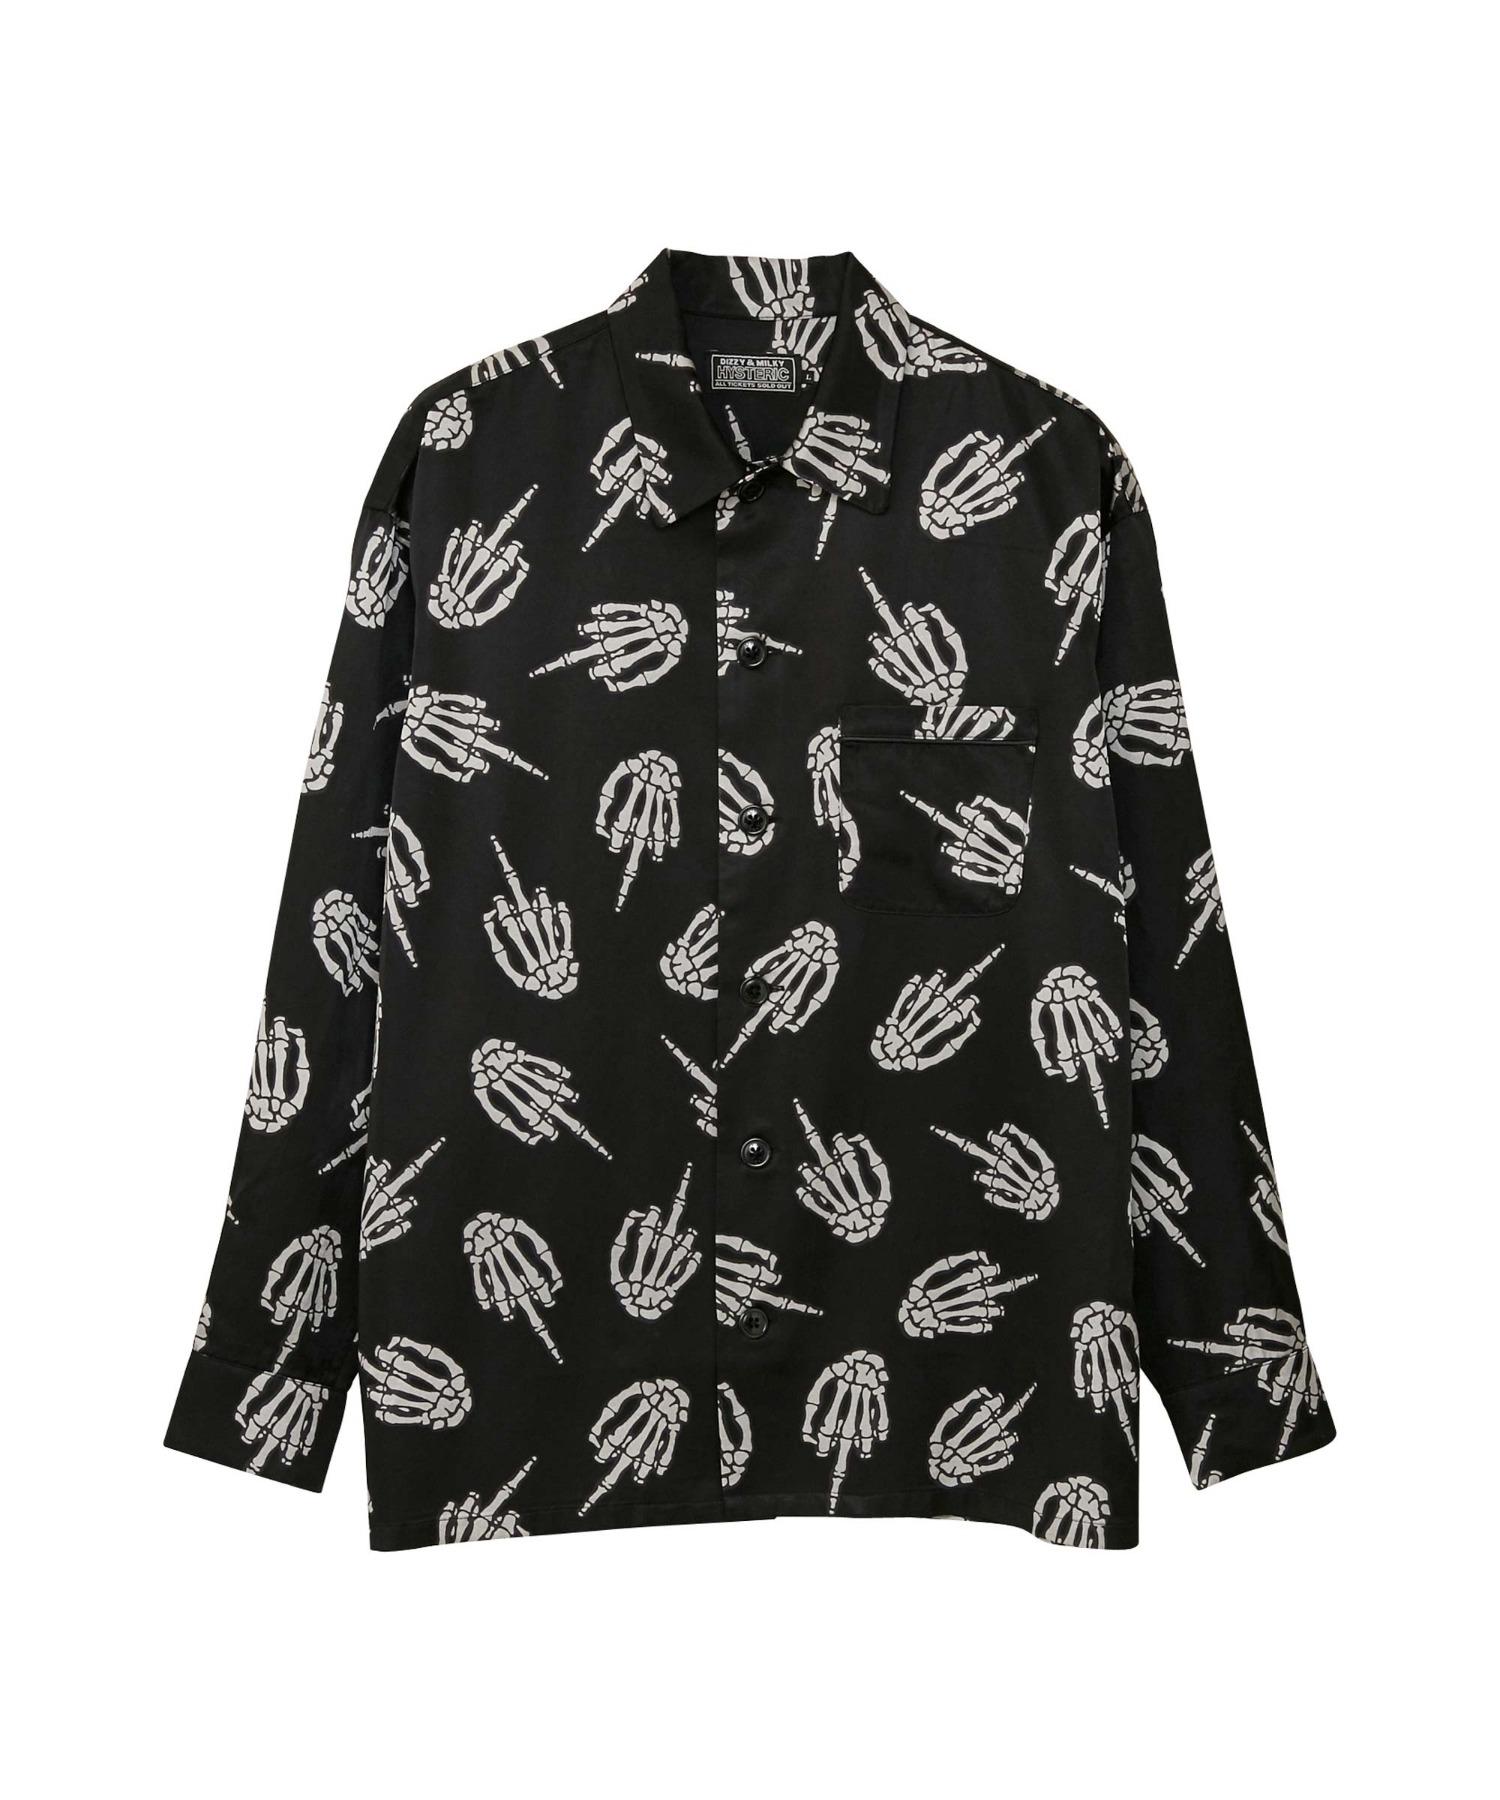 MIDDLE FINGER柄 パジャマシャツ